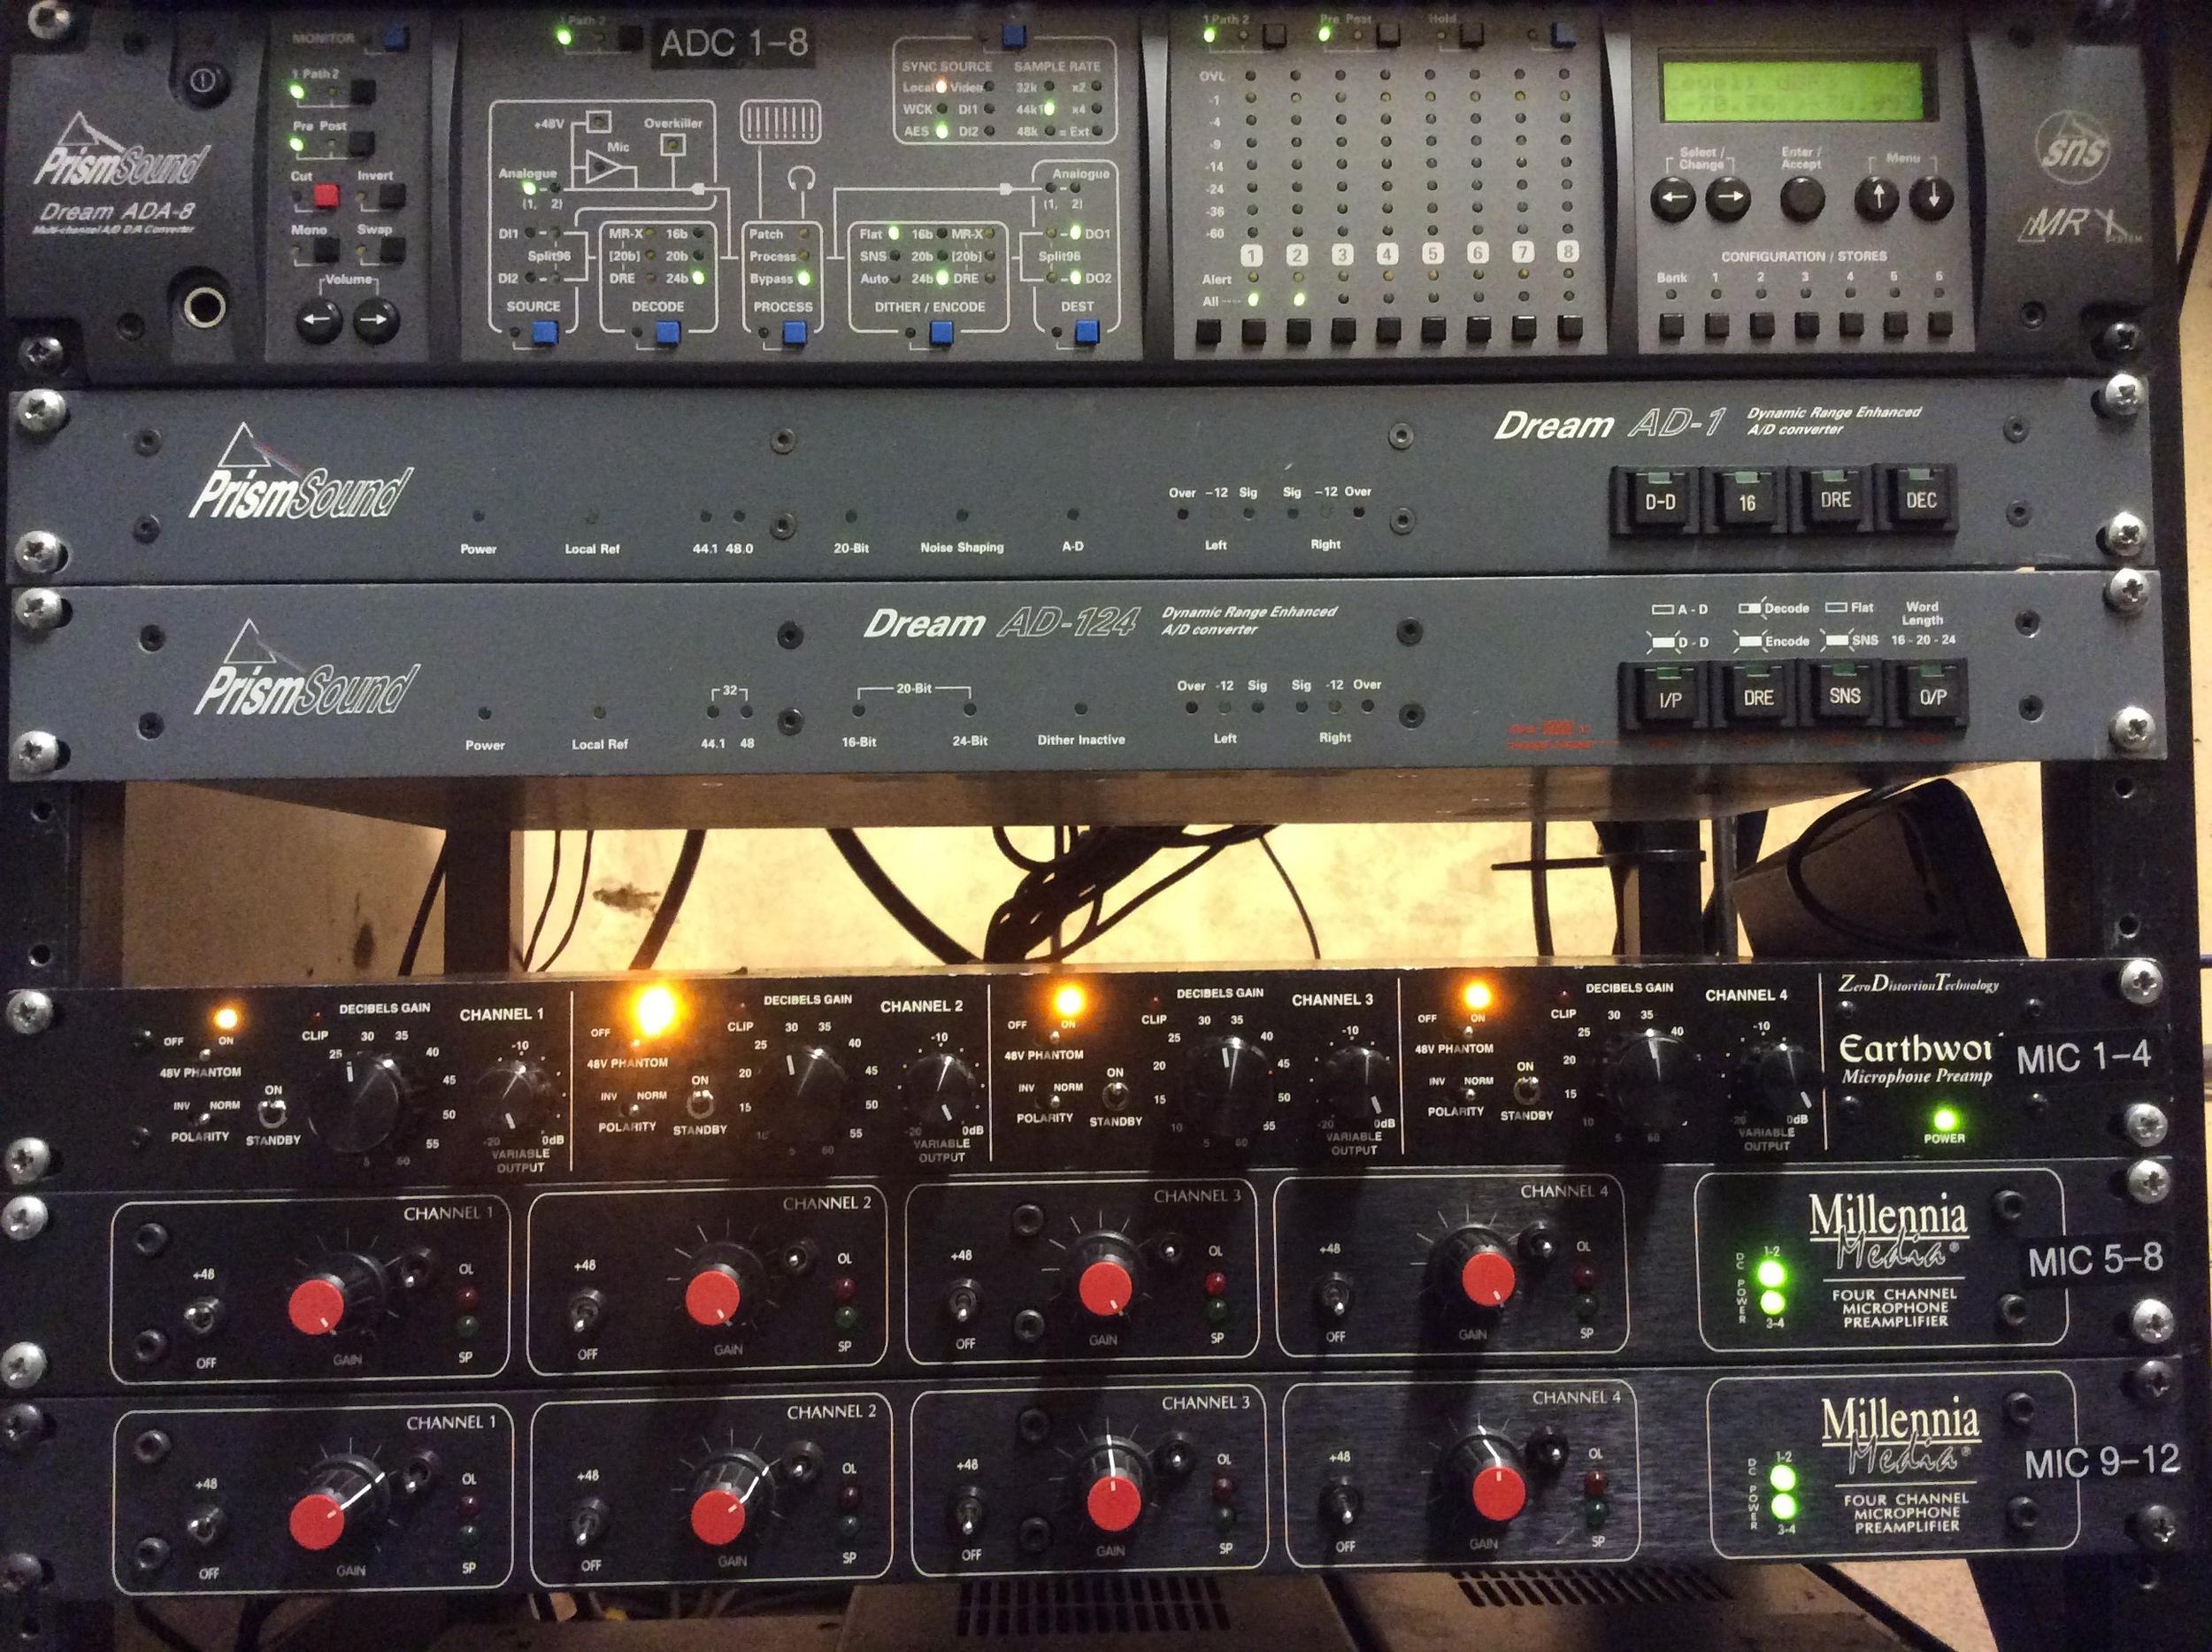 Glyndebourne recording equipment